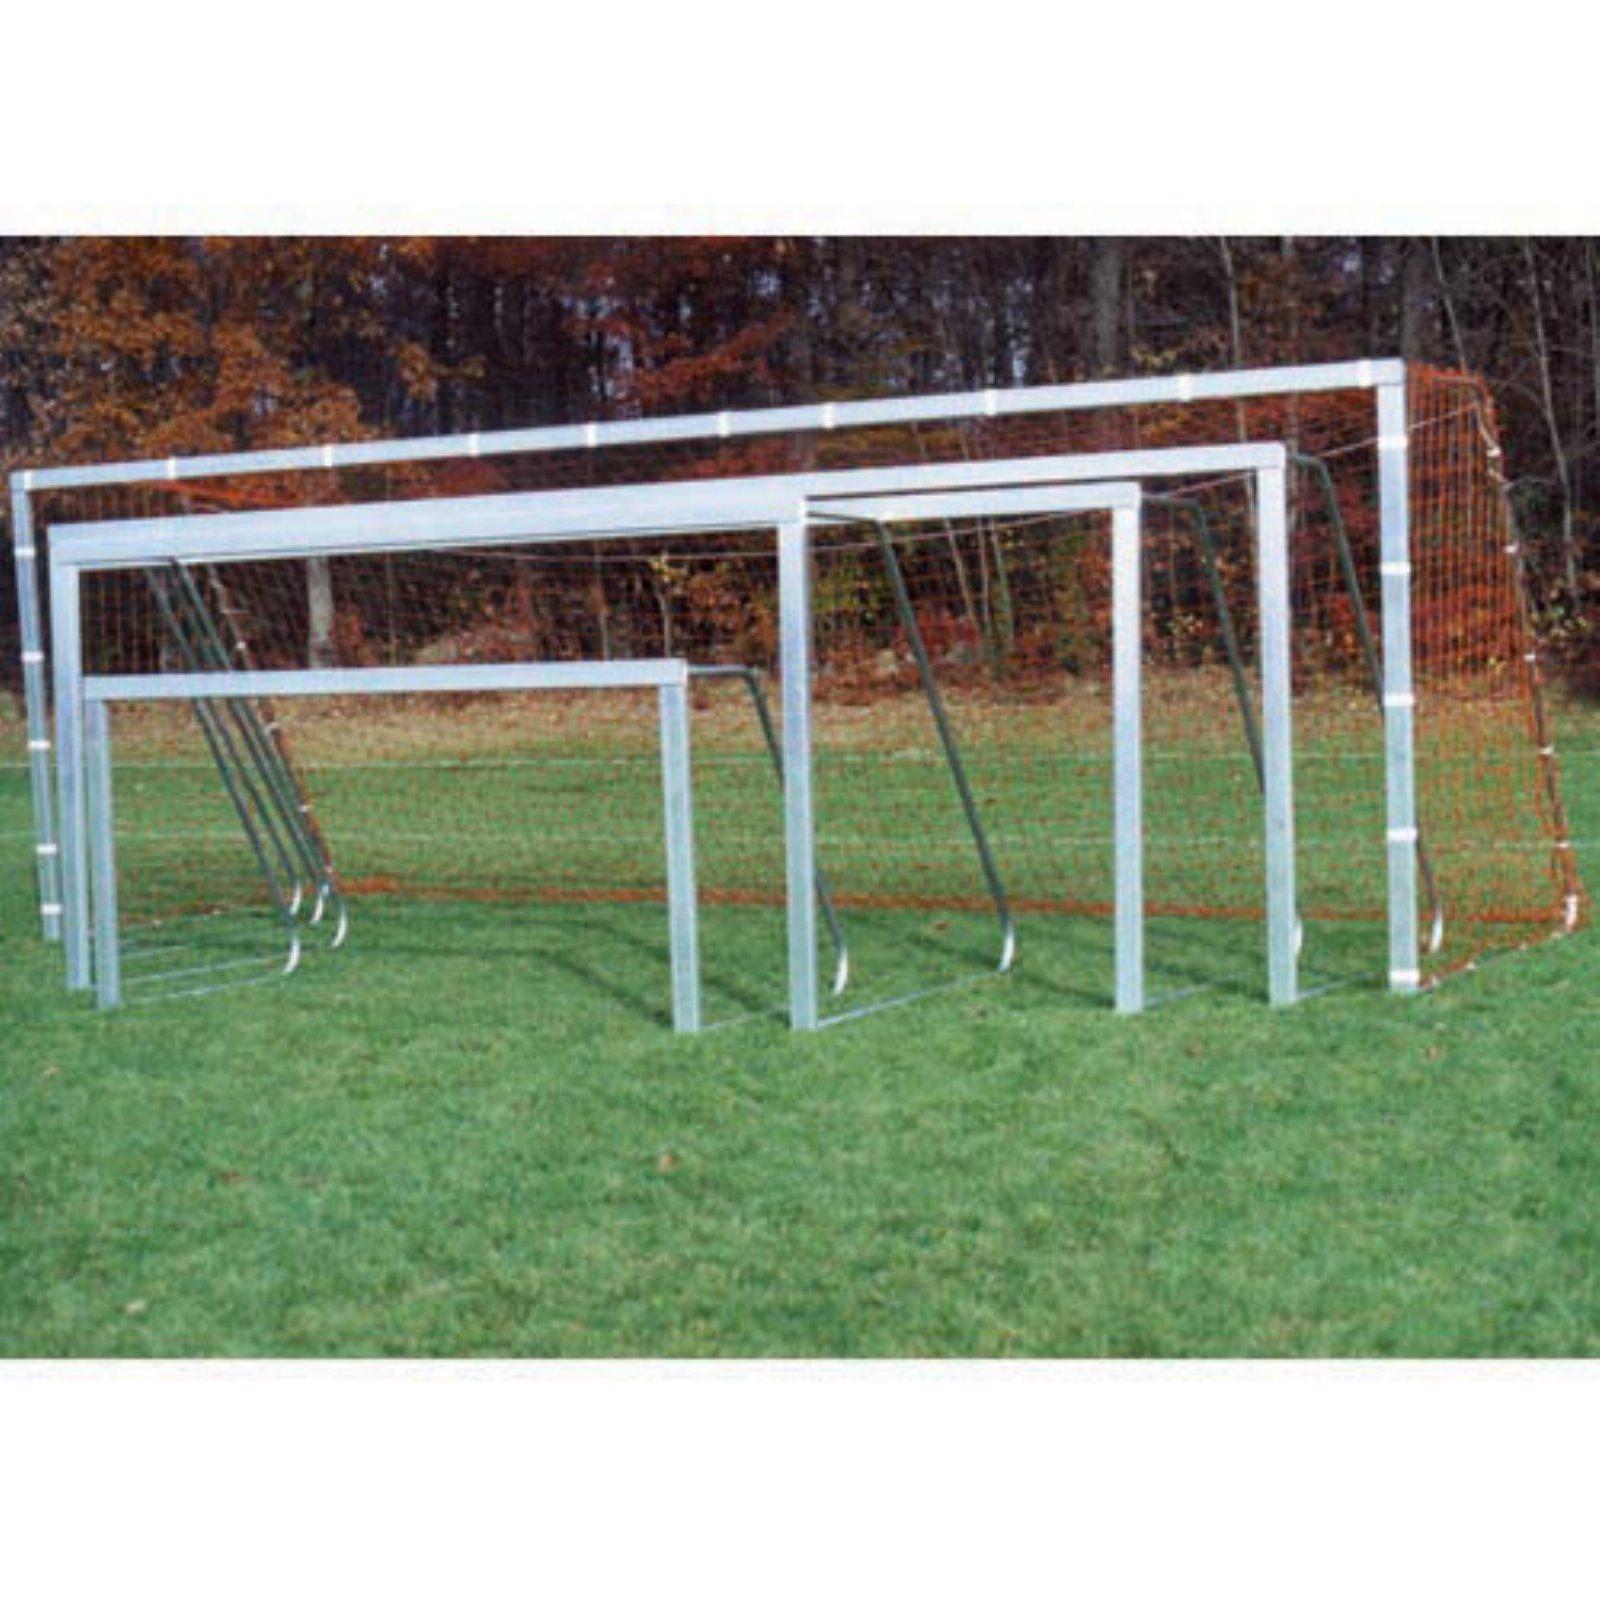 Goal Sporting Goods Unpainted Square Recreational Soccer Goals - Pair